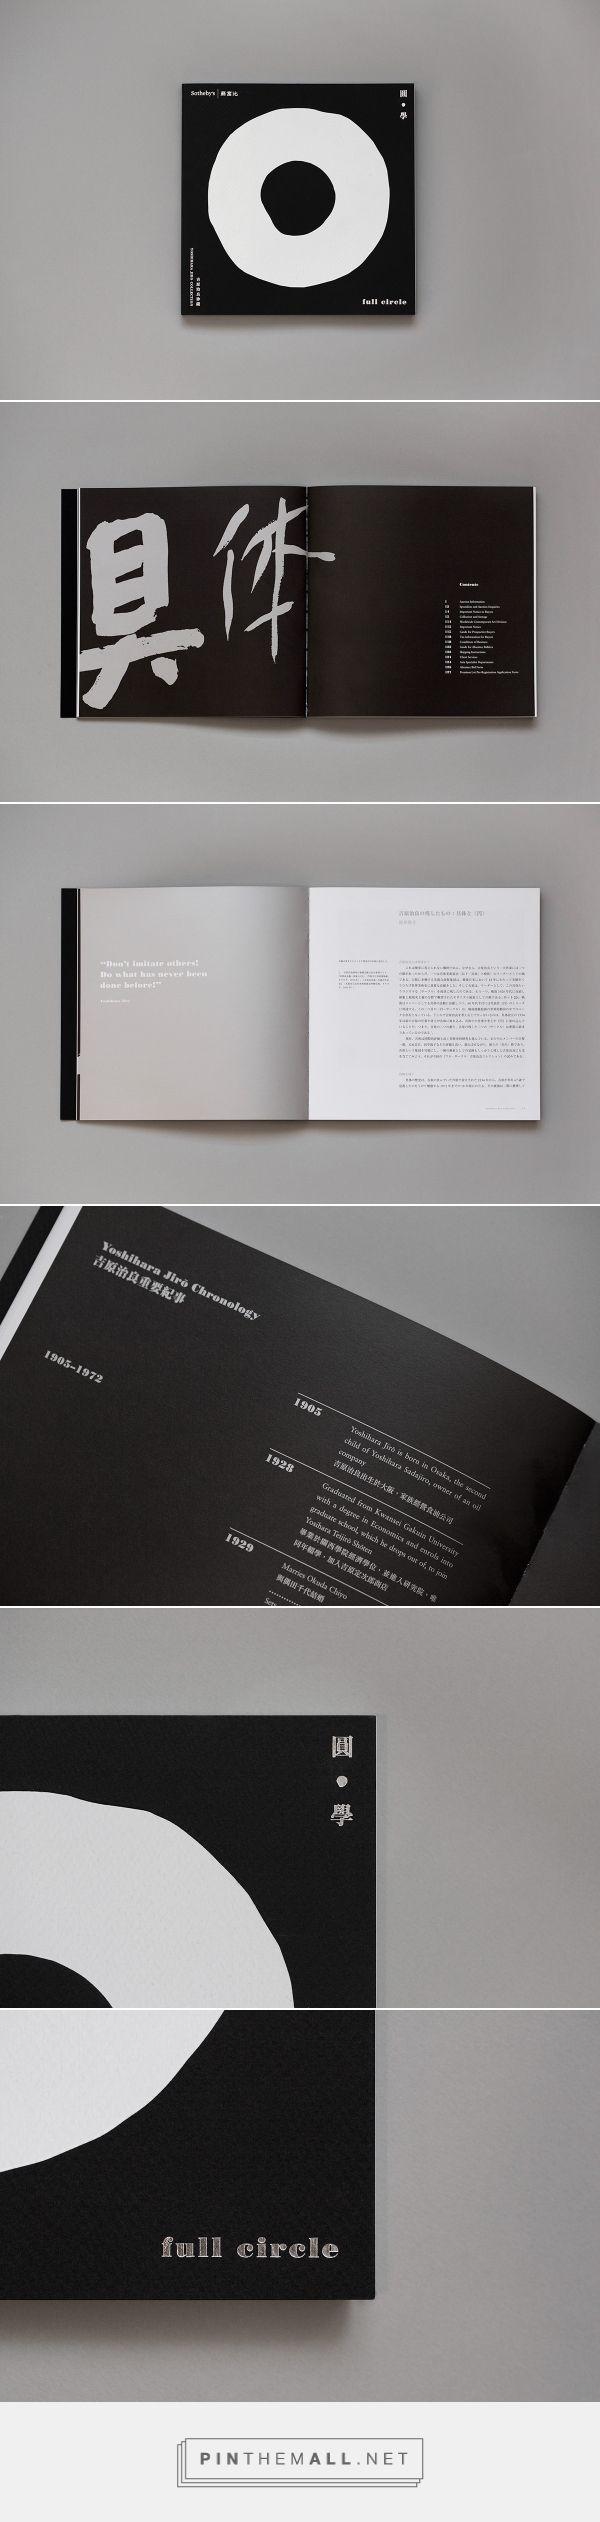 Full Circle – Yoshihara Jiro Collection by Renatus Wu